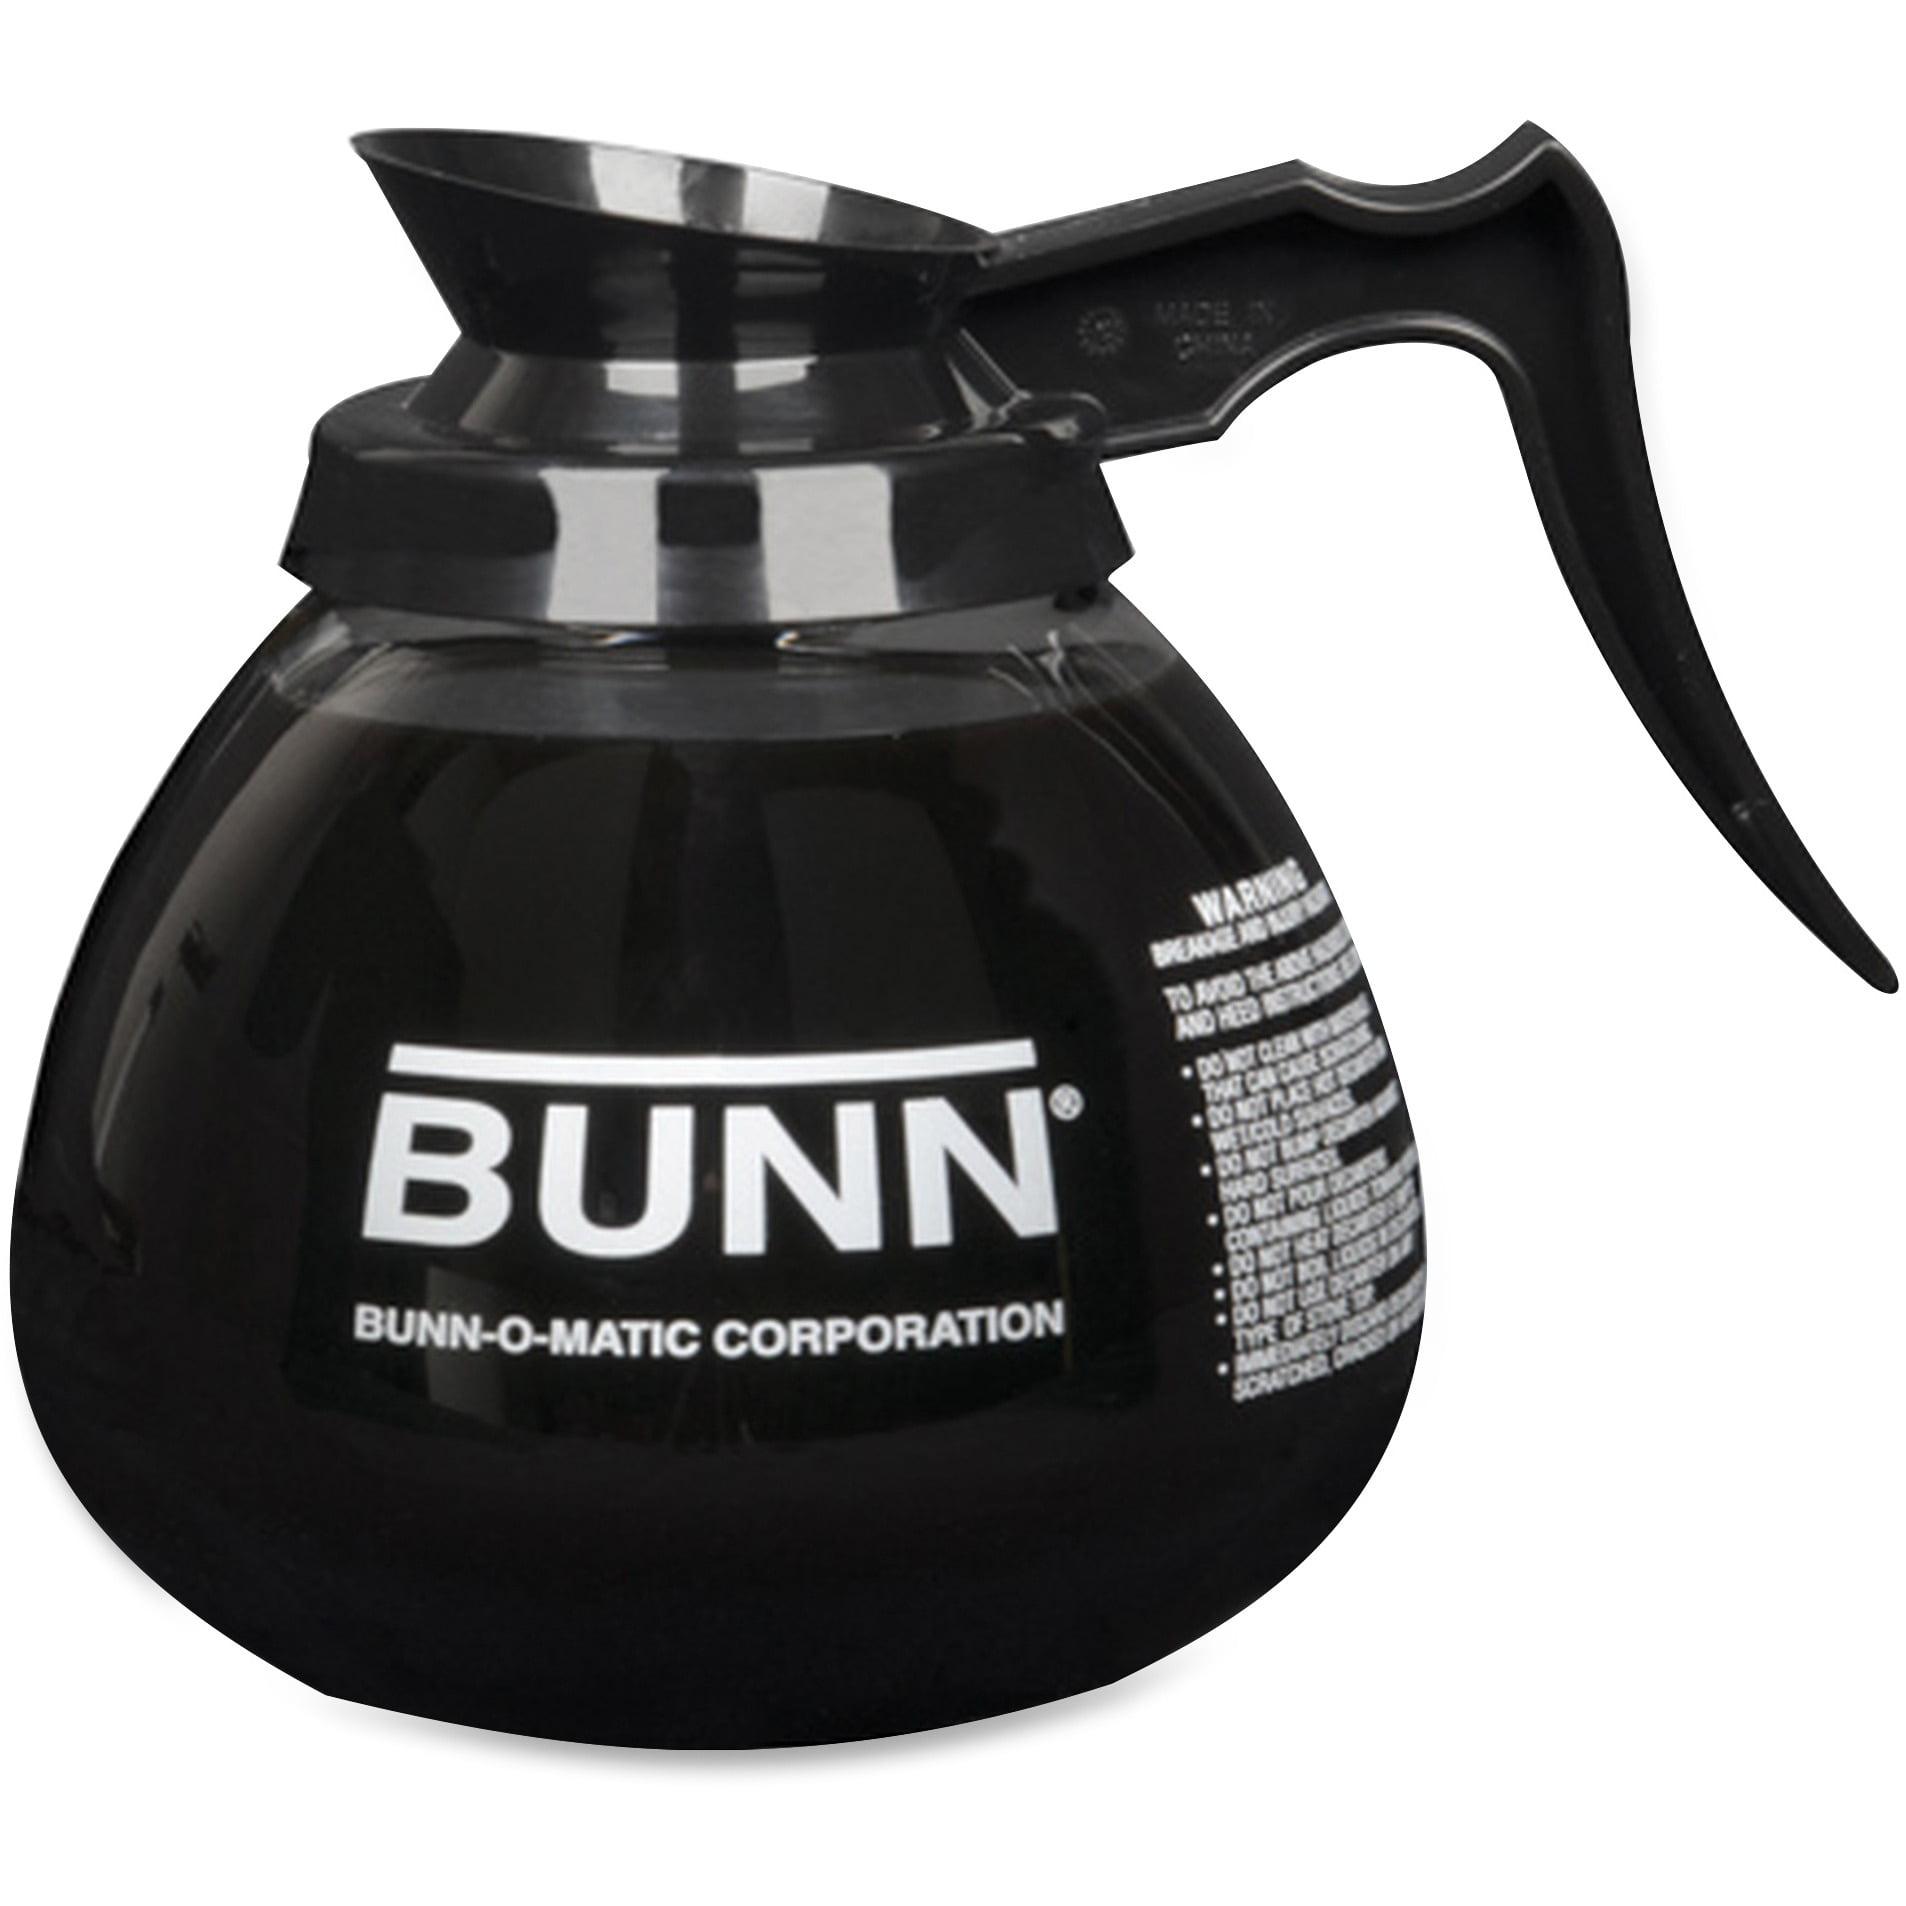 BUNN, BUN424000101, 12-Cup Pour-O-Matic Decanter, 1 Each, Clear